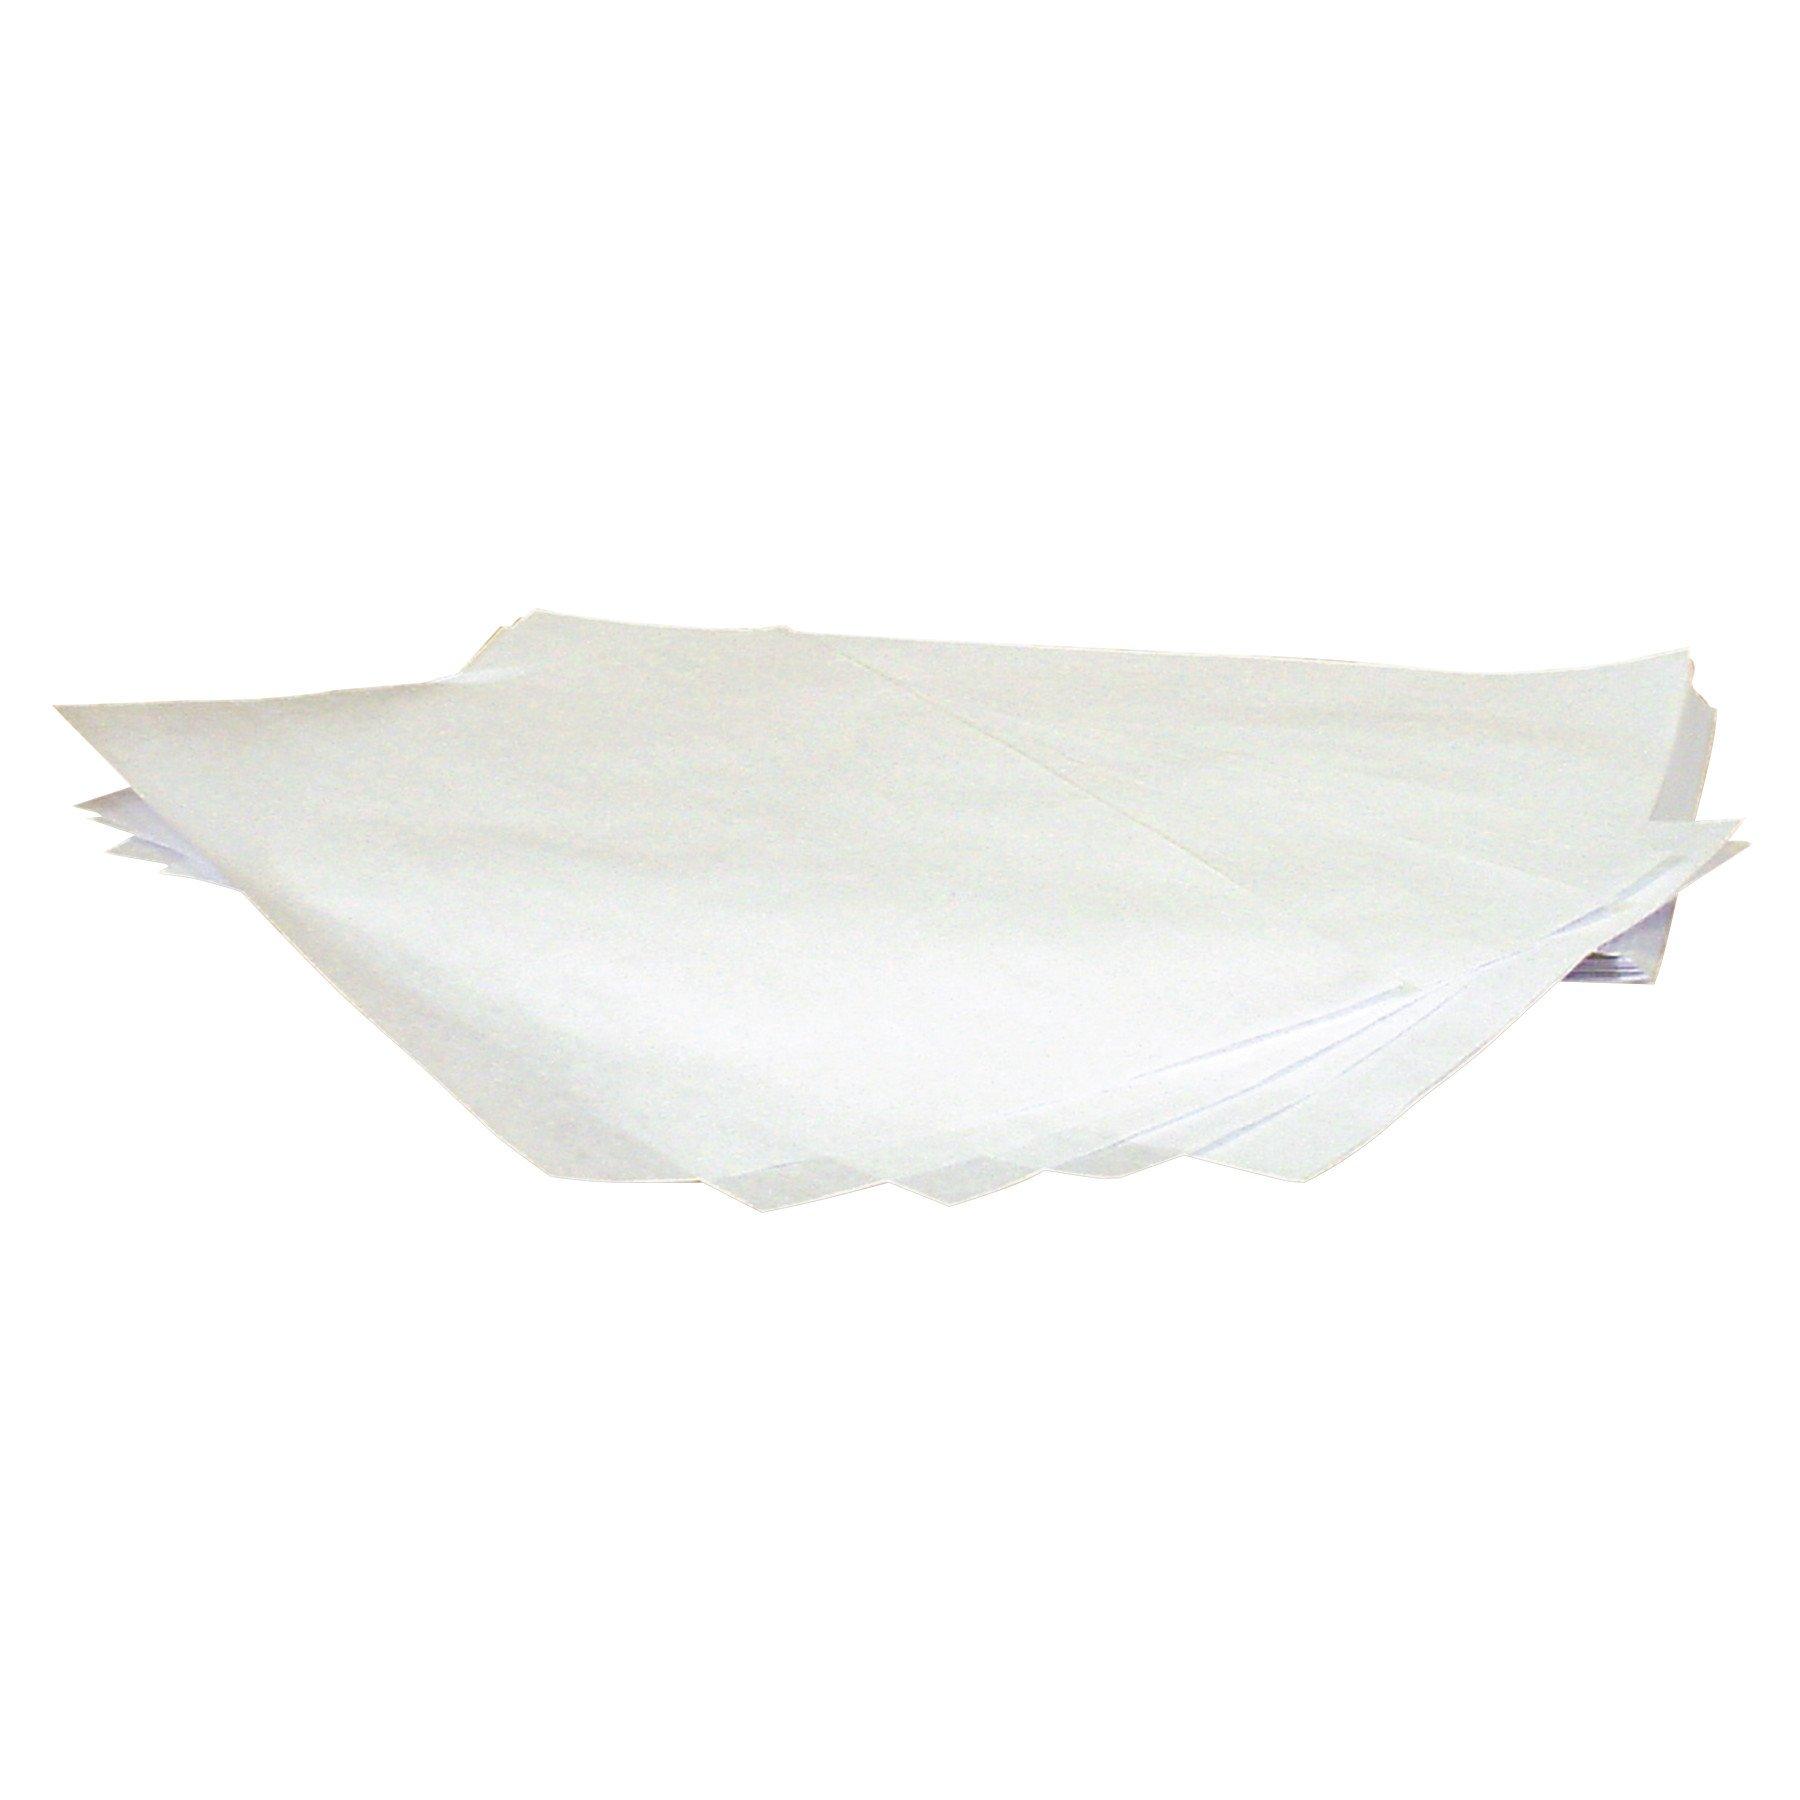 Boardwalk F364510006M Freezer Paper, 36'' x 1000 ft, White